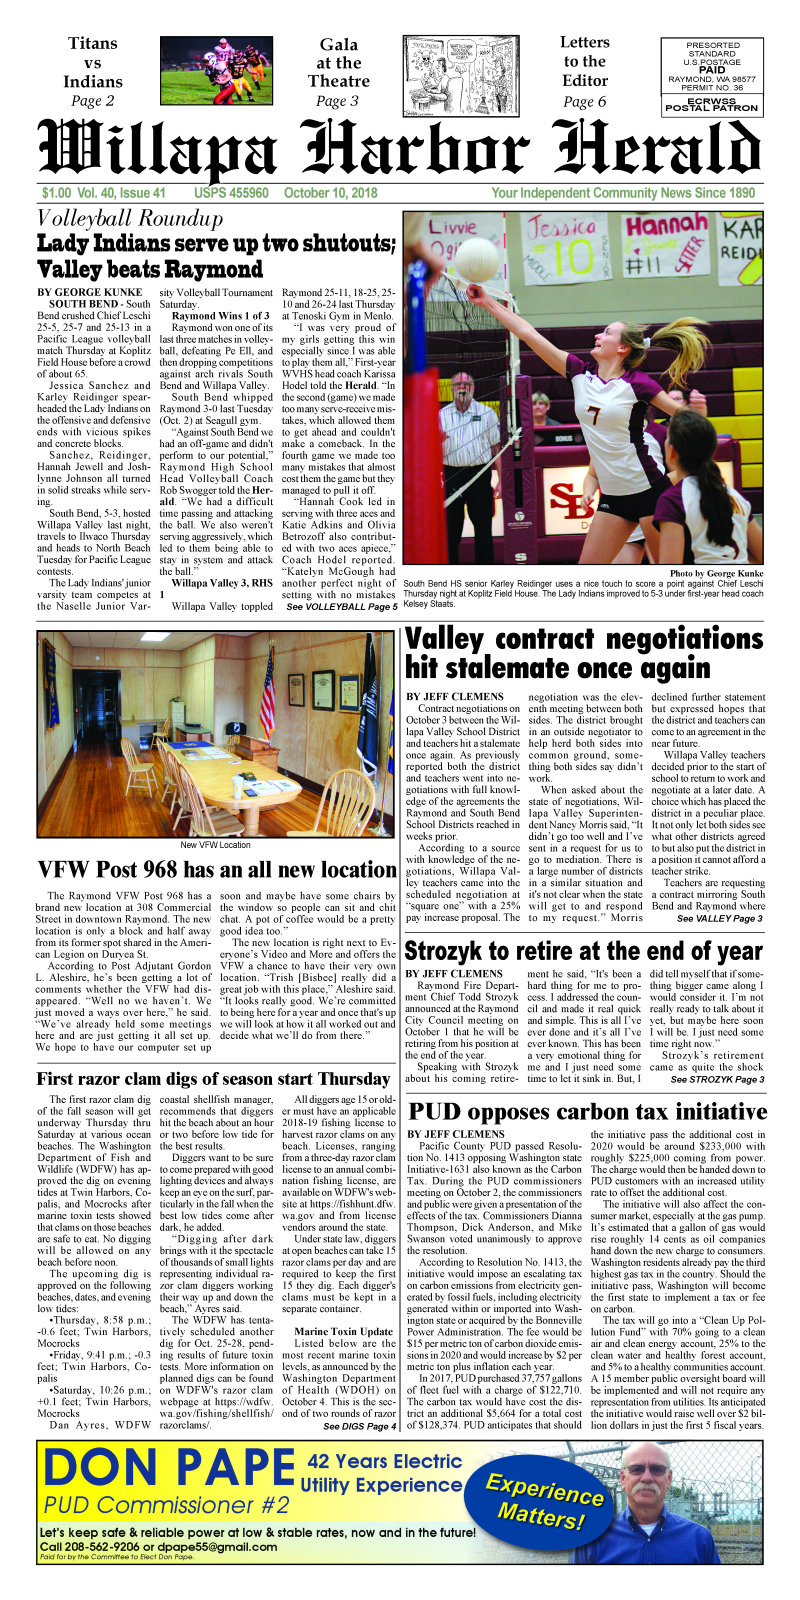 October 10, 2018 Willapa Harbor Herald